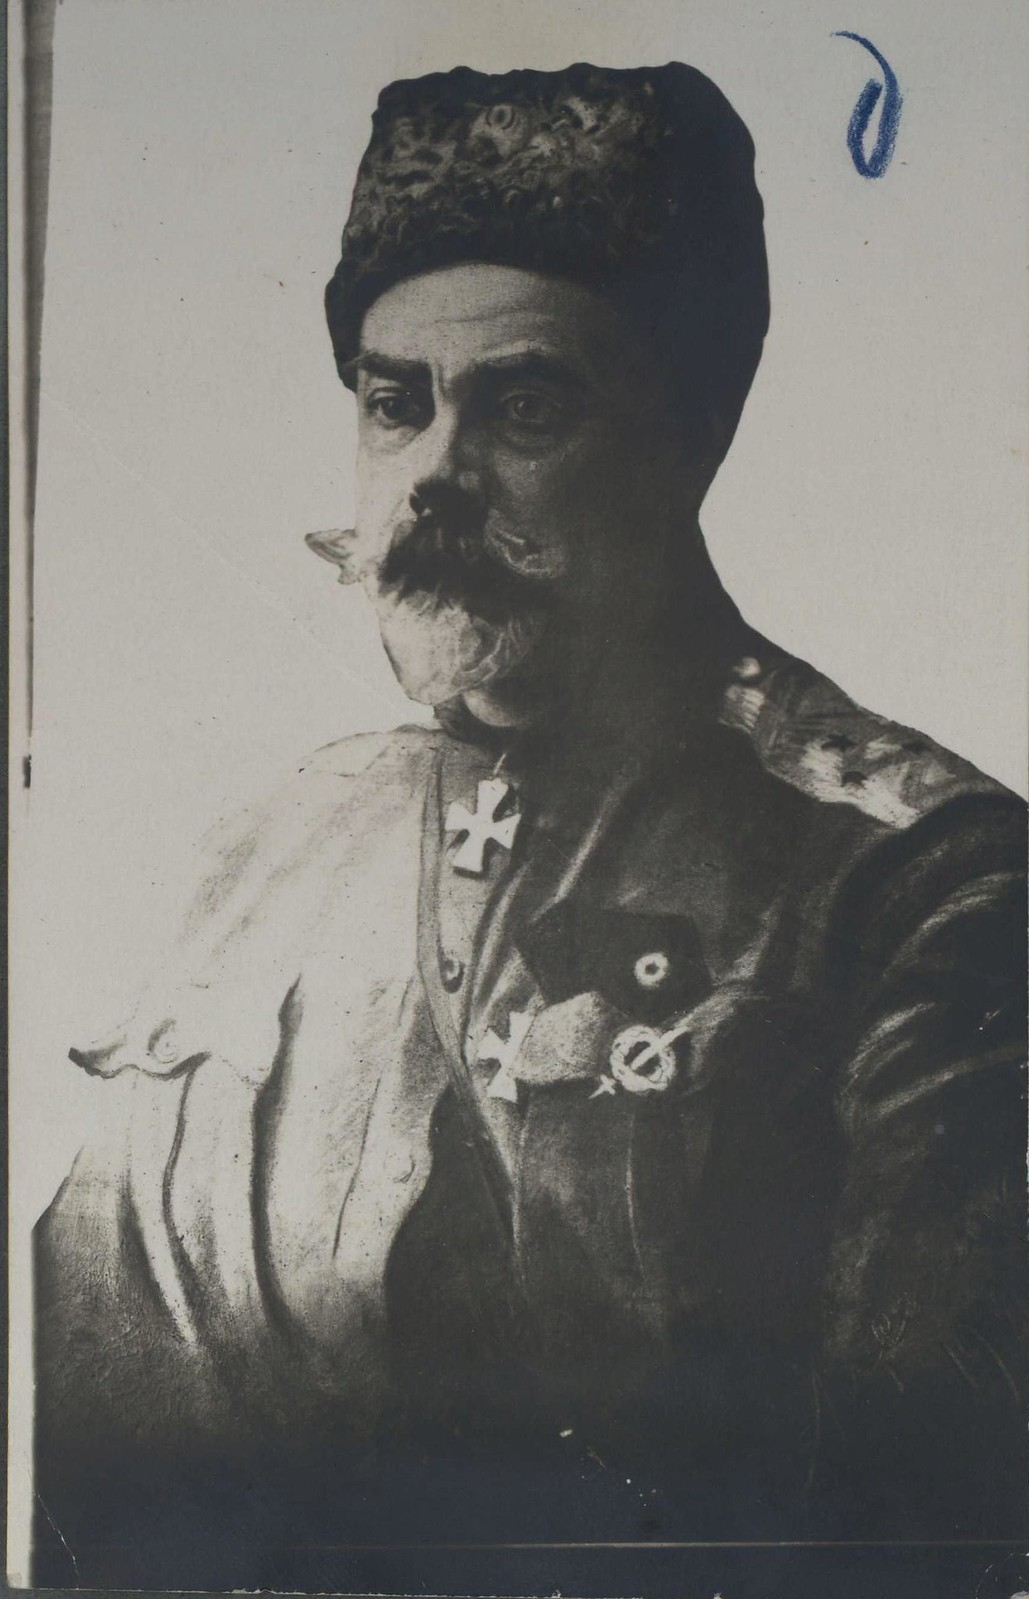 03.Генерал-лейтенант Антон Иванович Деникин